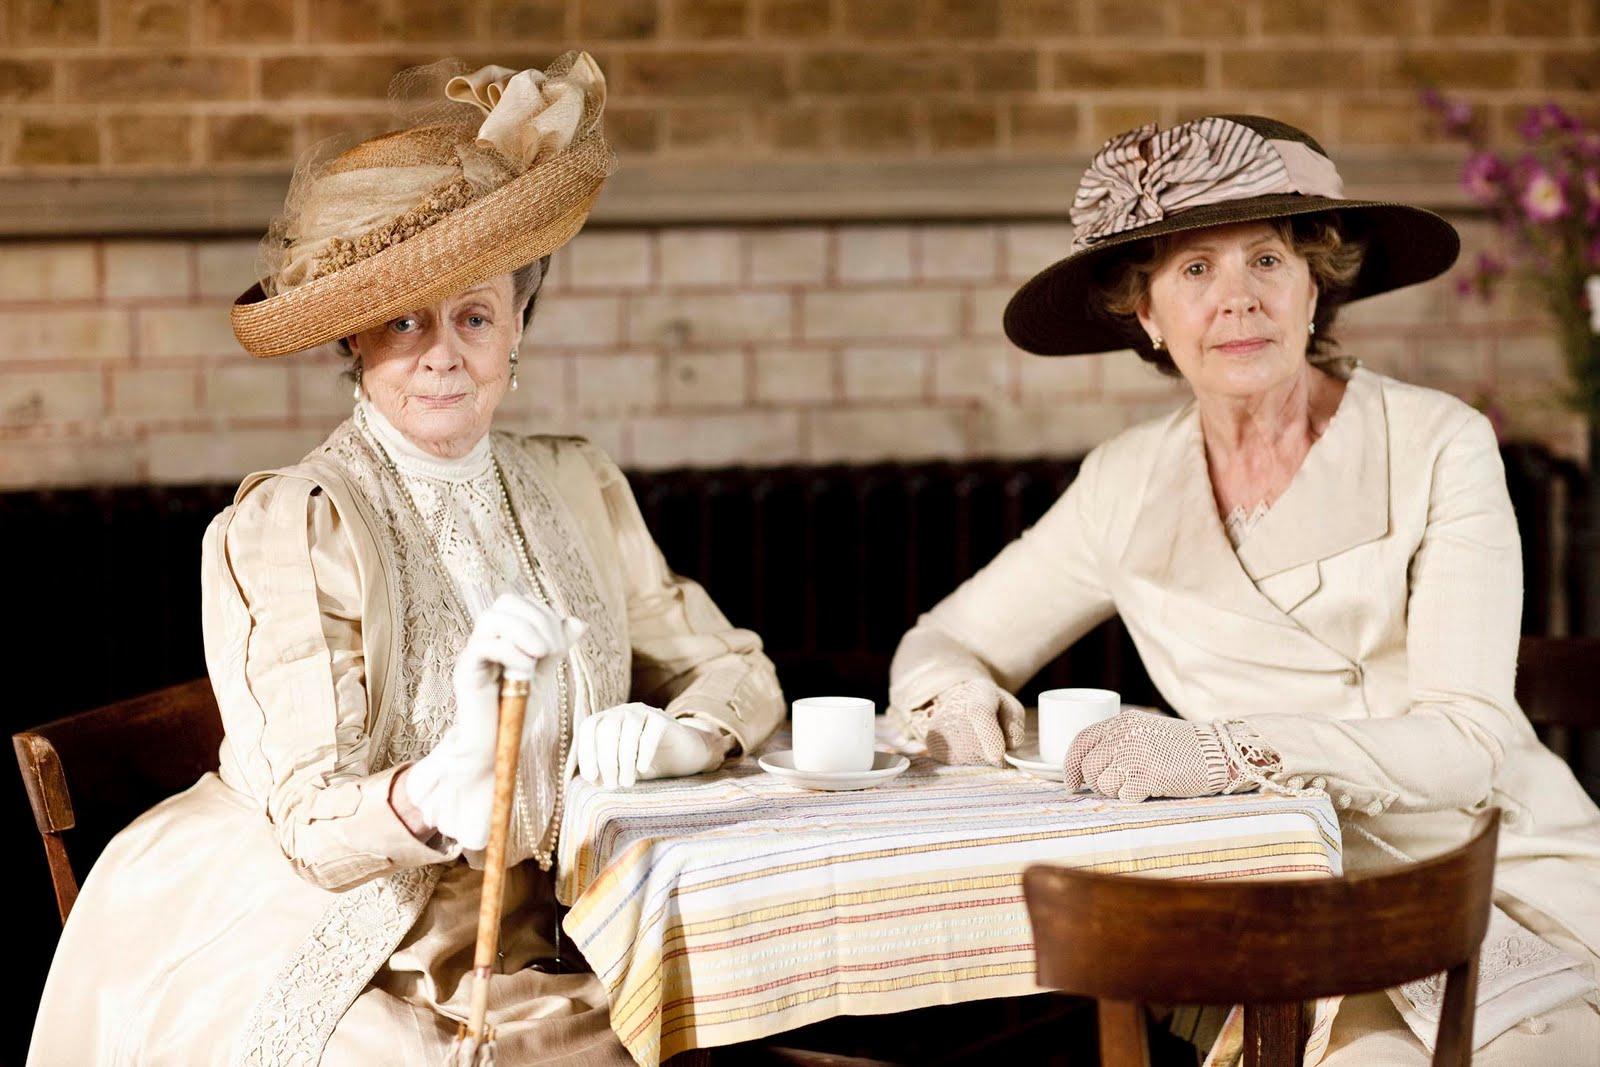 Downton Abbey stills featuring Penelope Wilton